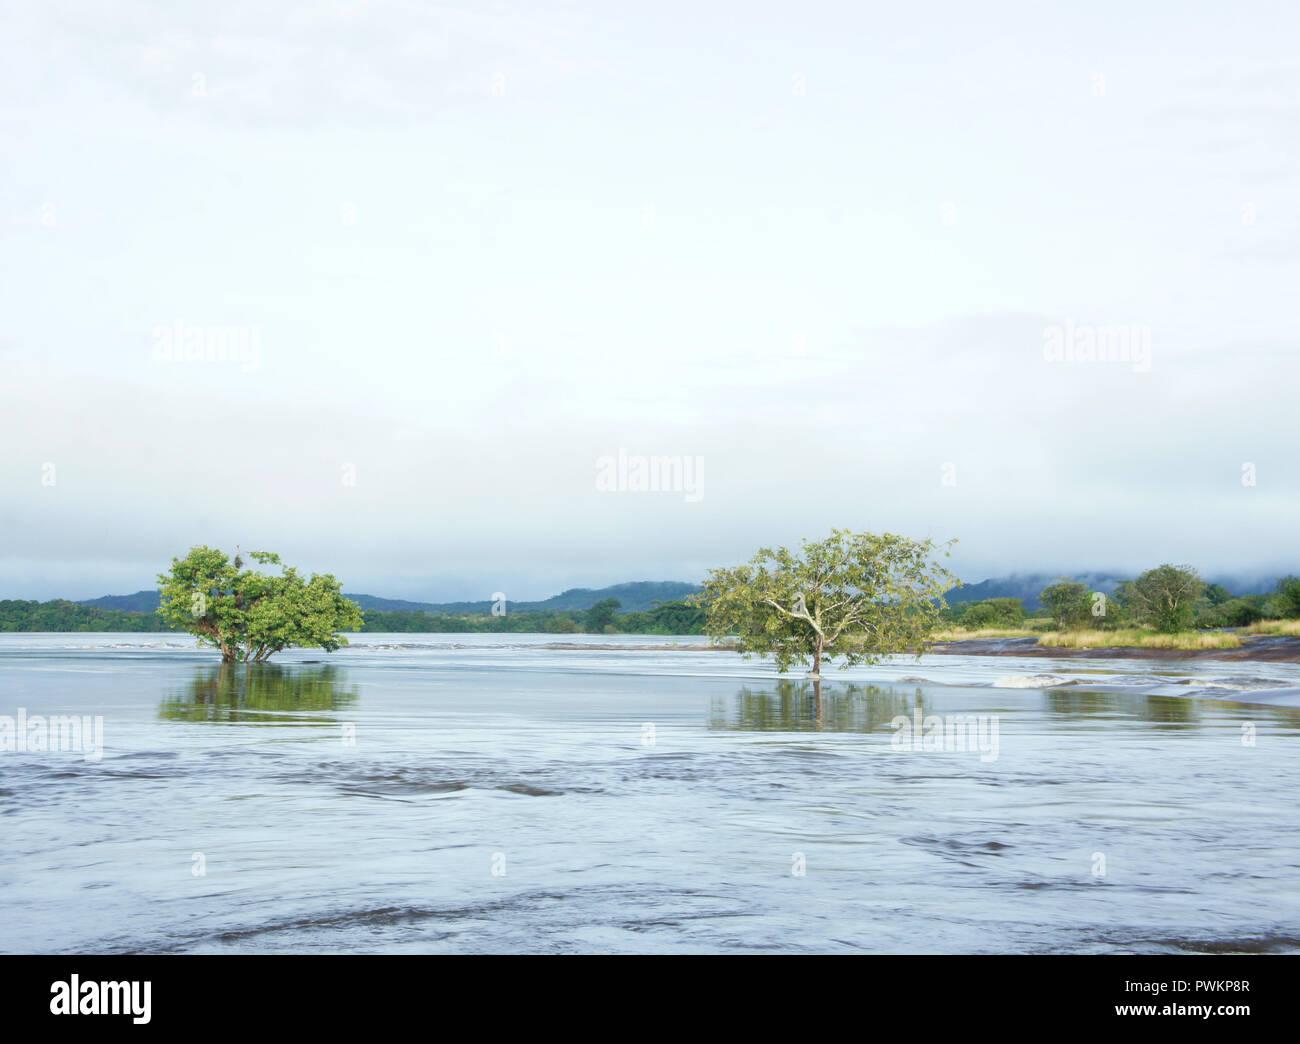 Landscape photography of the Amazon region in Venezuela. High tide water. - Stock Image